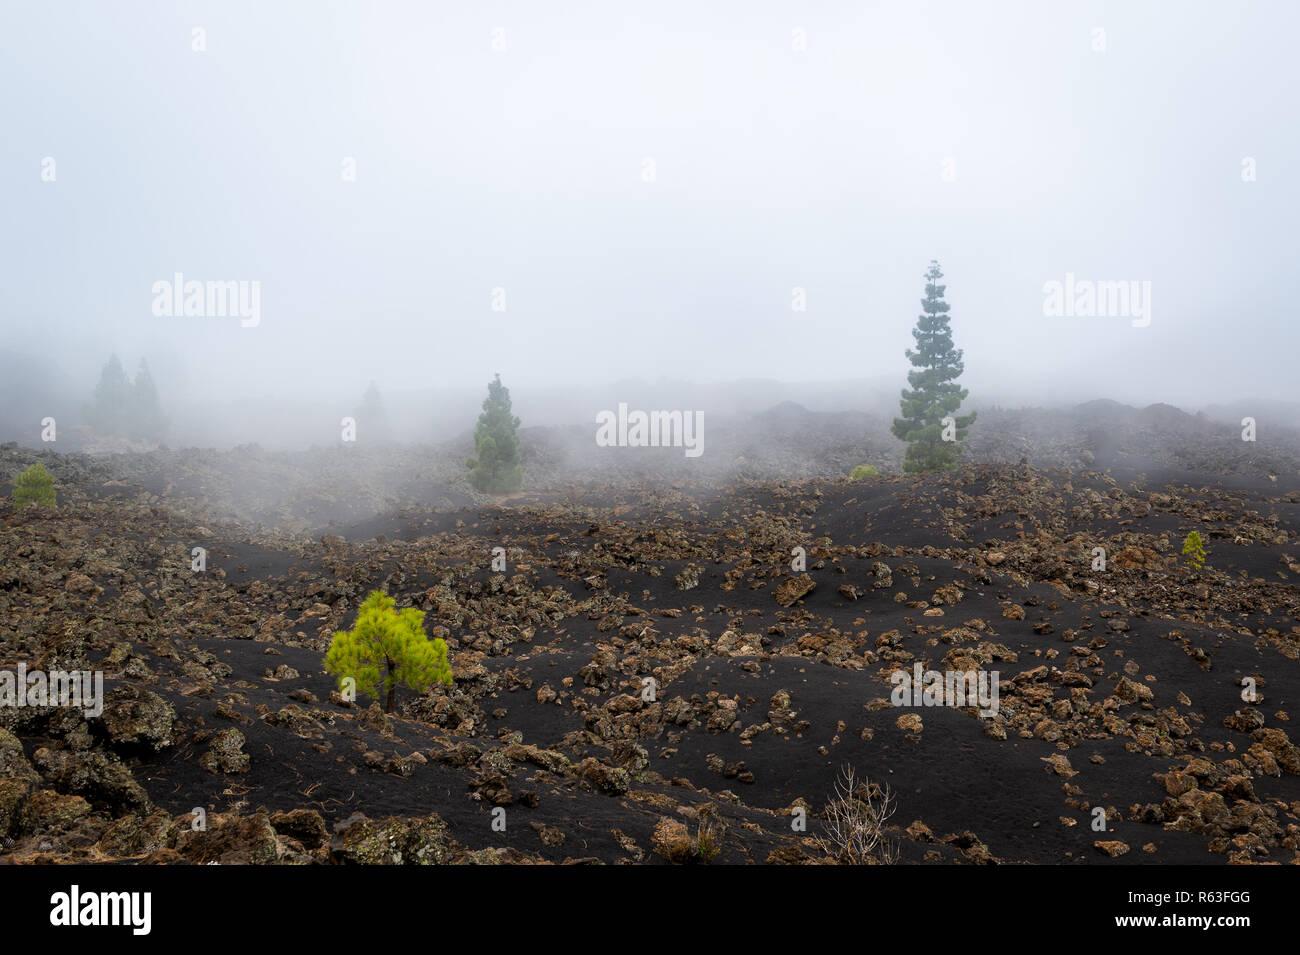 Black volcano fields. Chinyero, Tenerife island. - Stock Image